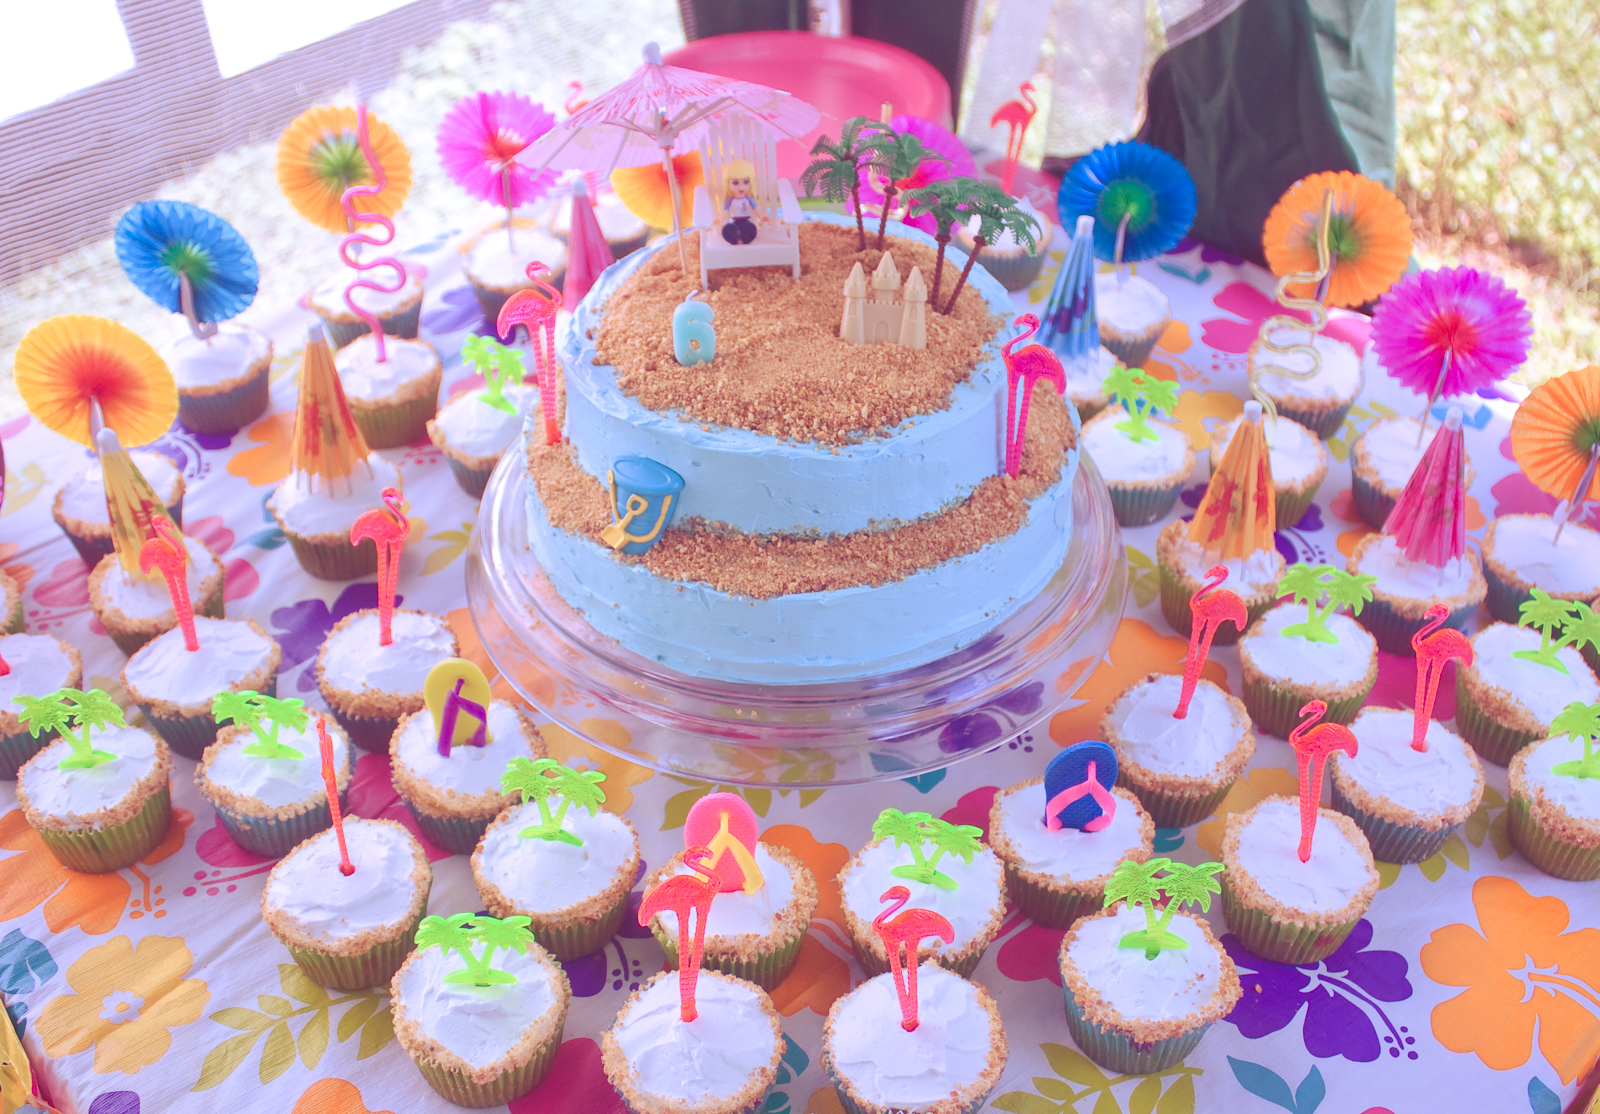 Giant Food Bakery Birthday Cakes